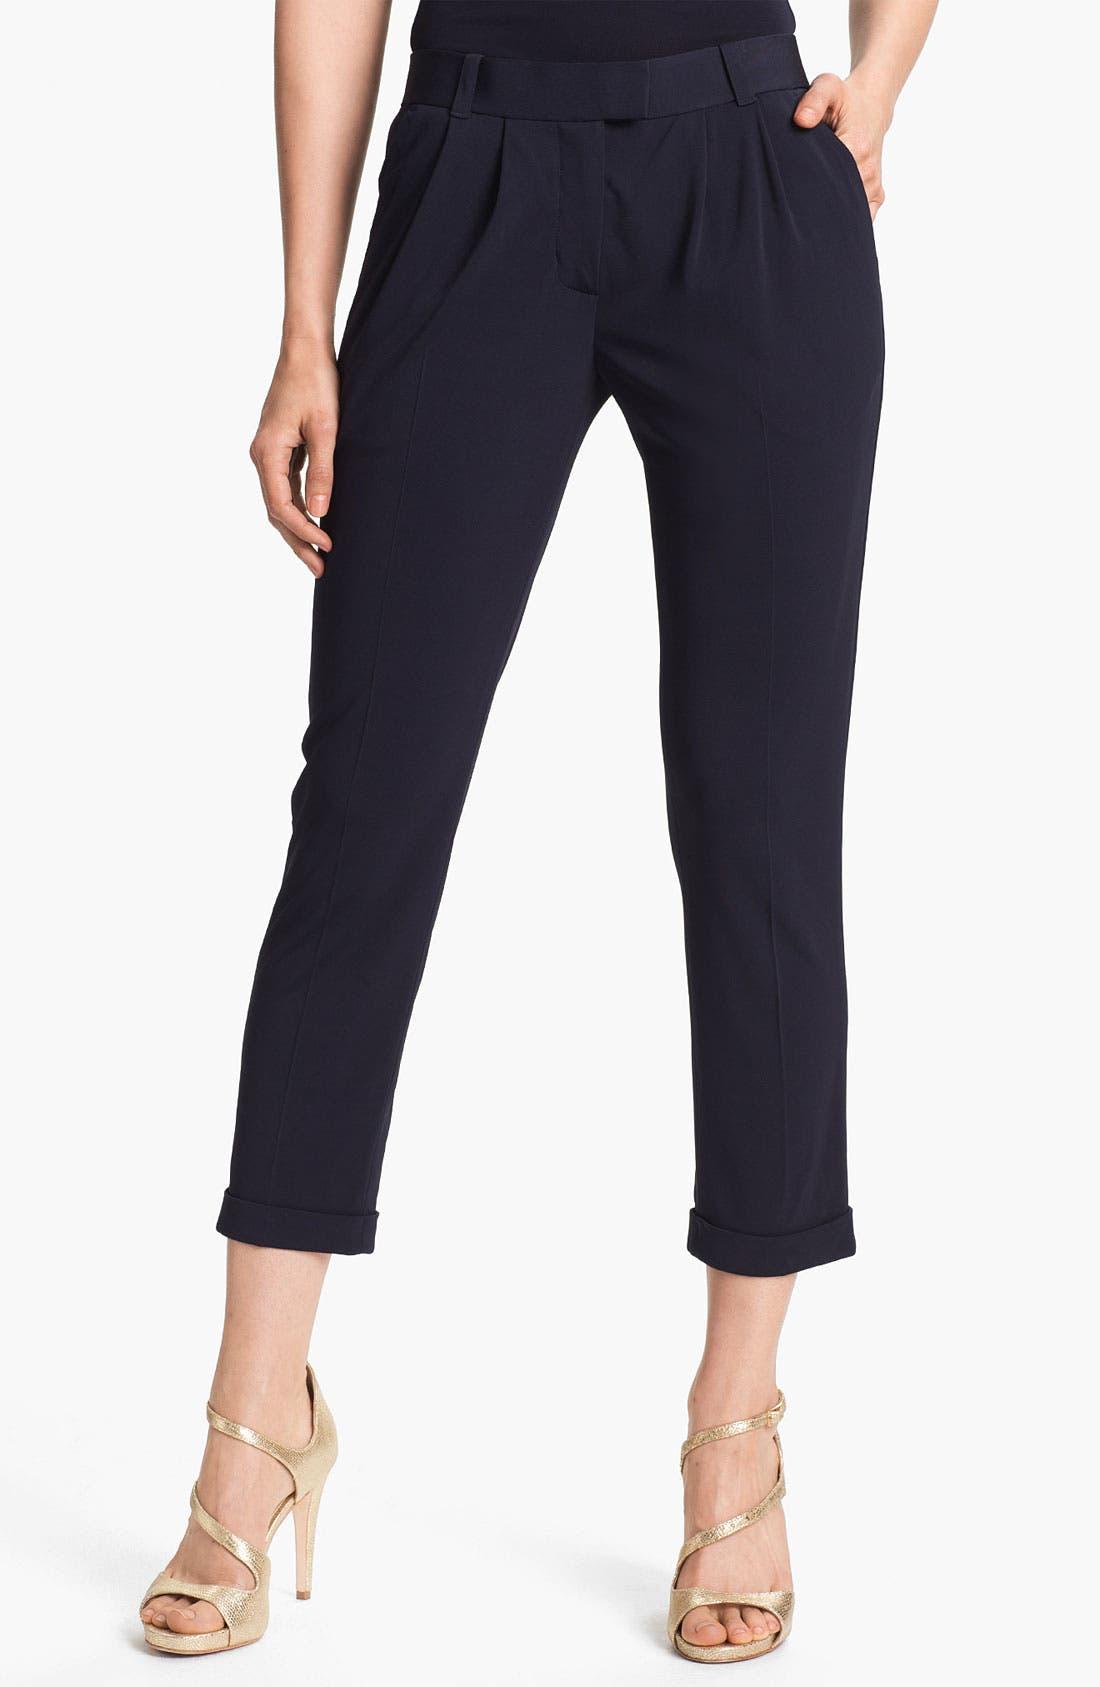 Alternate Image 1 Selected - Tory Burch 'Haley' Crop Pants